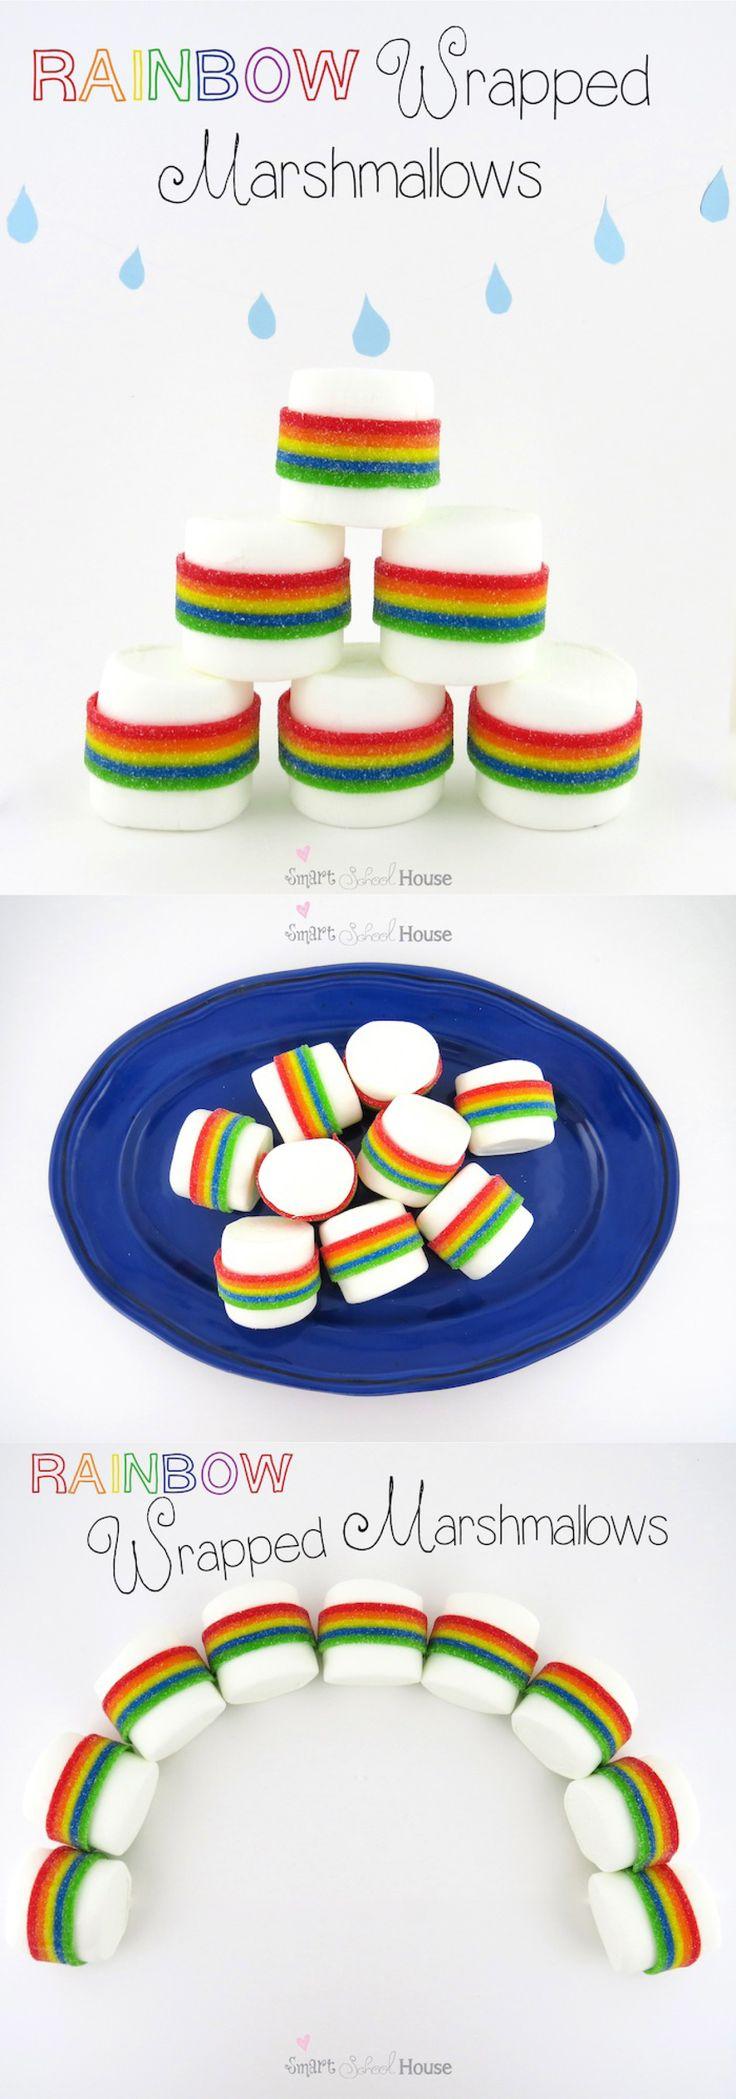 Rainbow marshmallows - Love these! So simple but really cute!